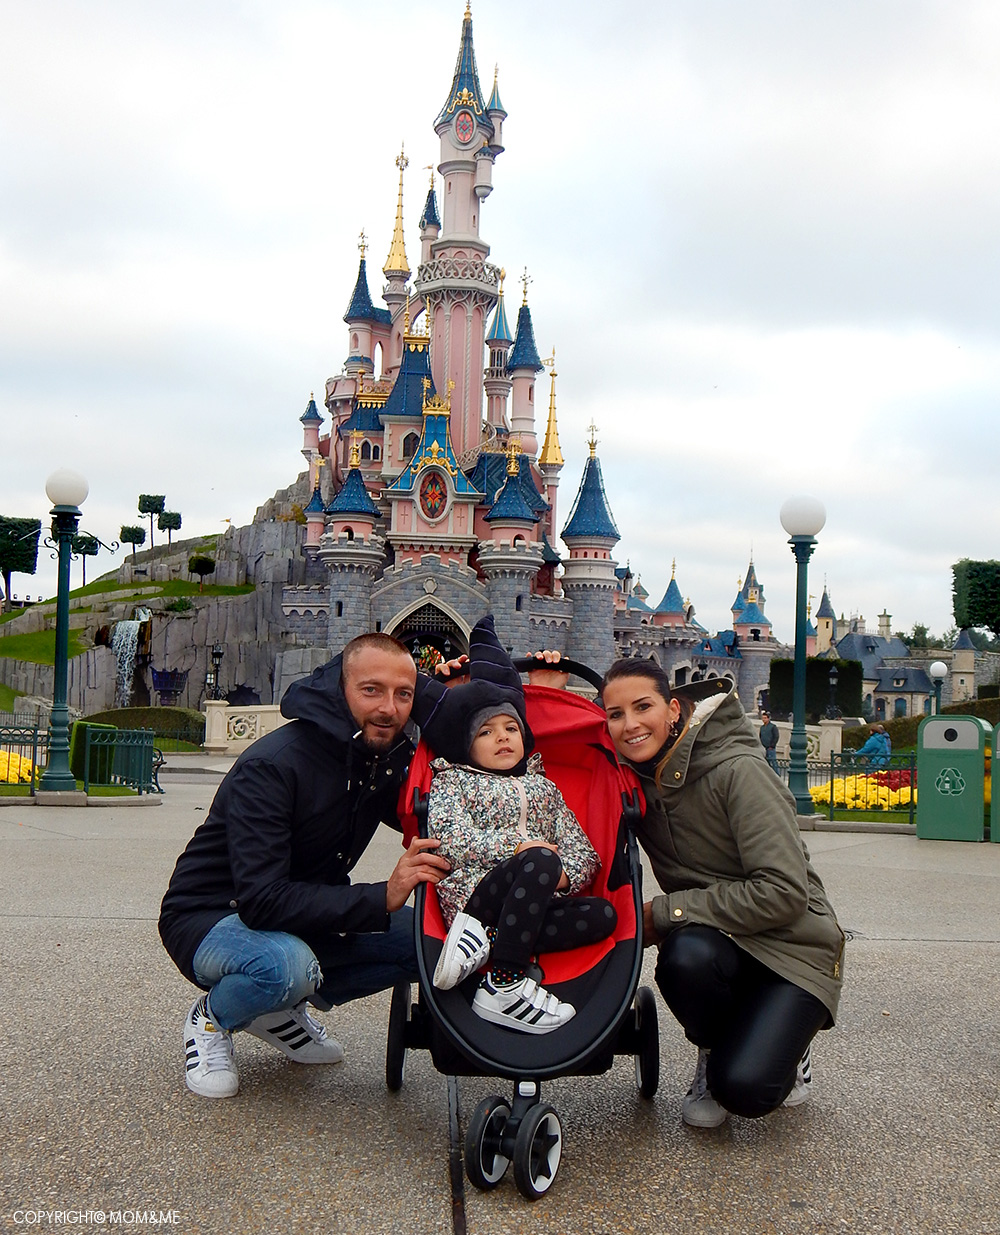 disneyland_paris_castello_principessa_famiglia_bambini_passeggino_agis_cybex_comfort_momeme